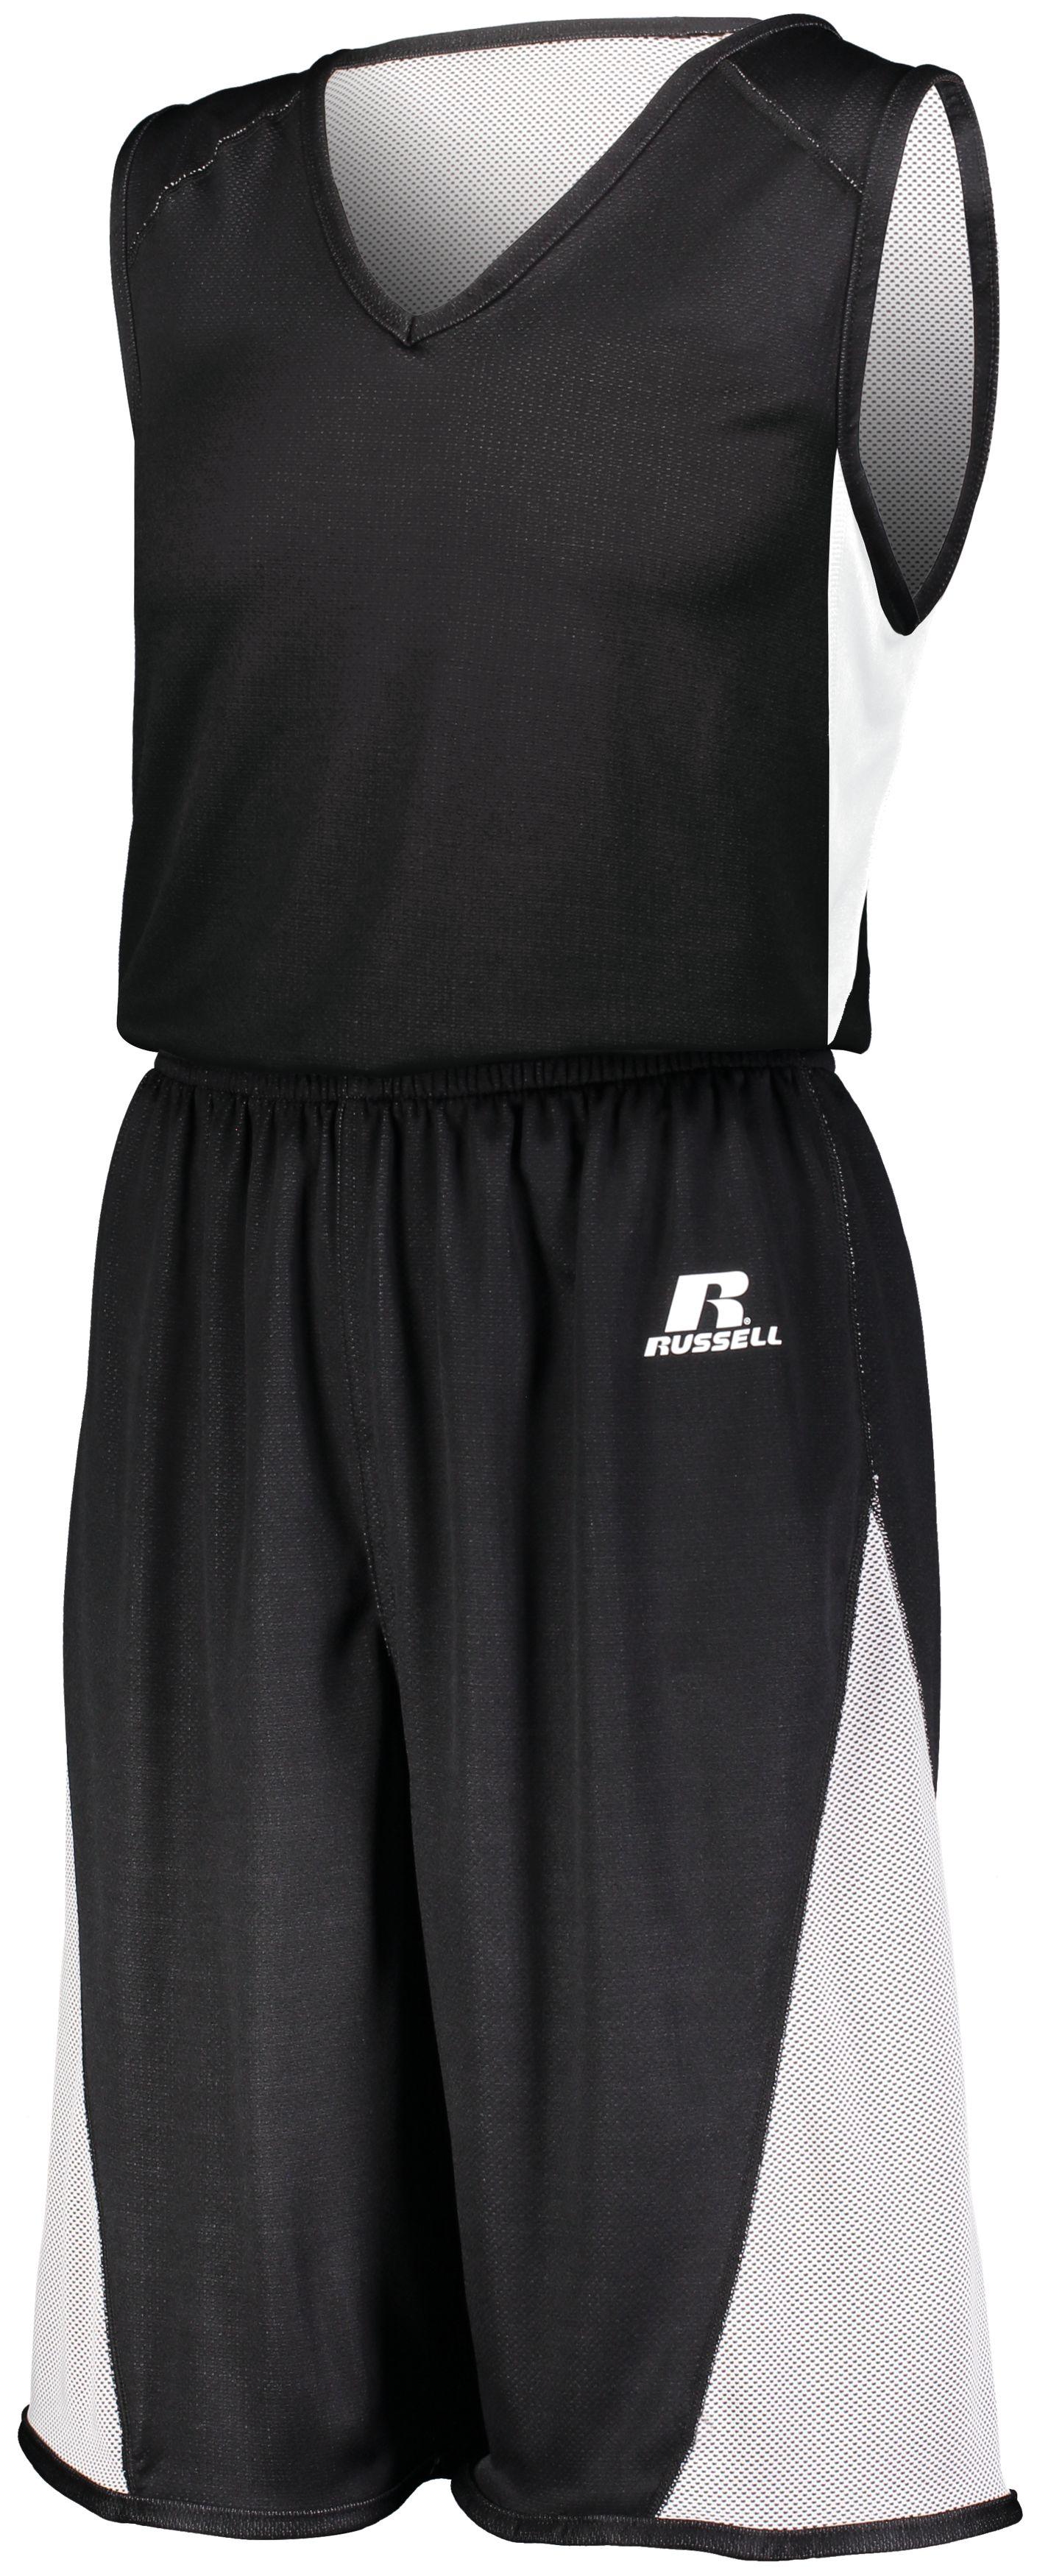 Undivided Single Ply Reversible Jersey - BLACK/WHITE